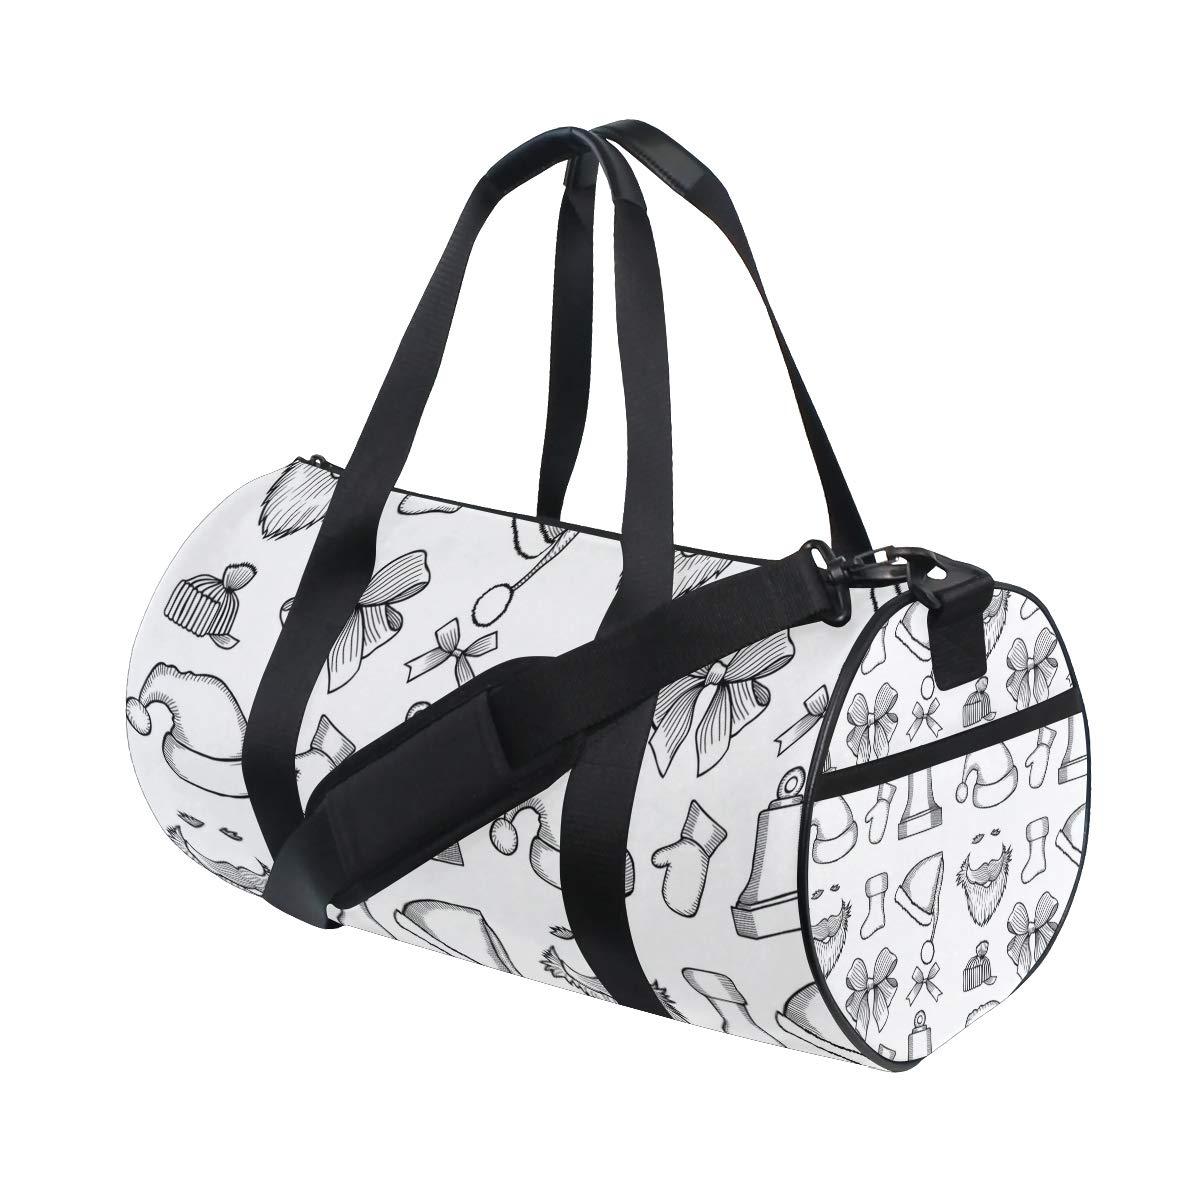 Waterproof Shoulder Bag. Santa Claus Black And White Movie Popular casual fitness bag,Non-Slip Wearable Crossbody Bag